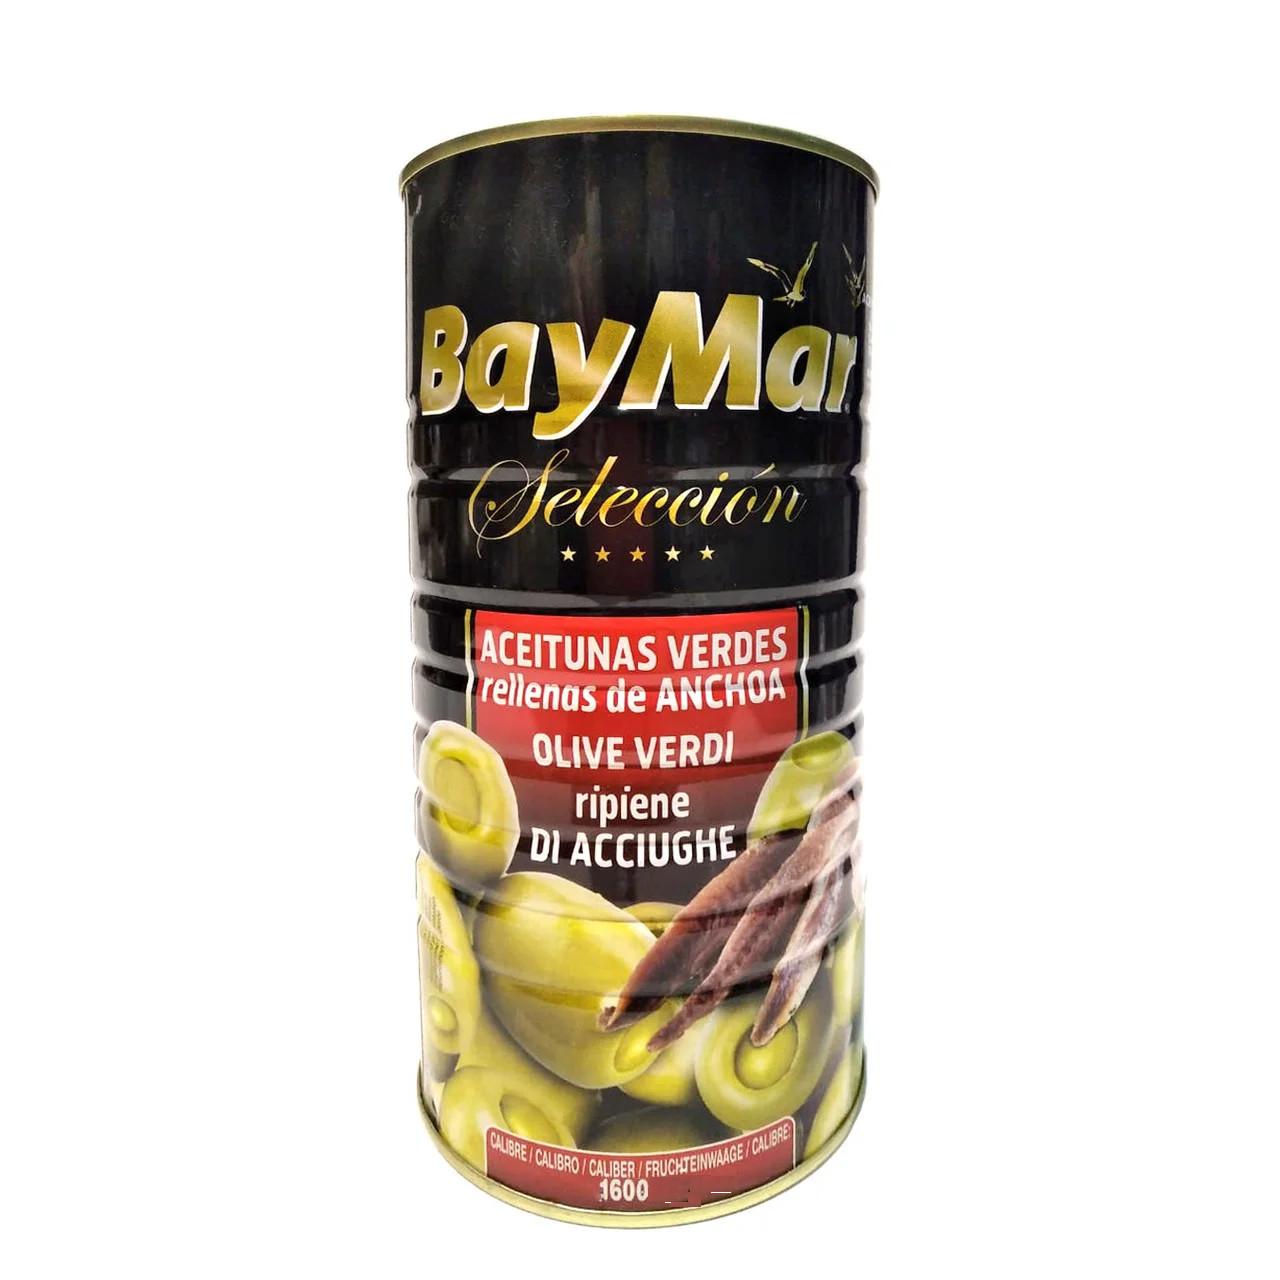 BayMar фаршировані анчоусом Gigante Rellena 1400/600